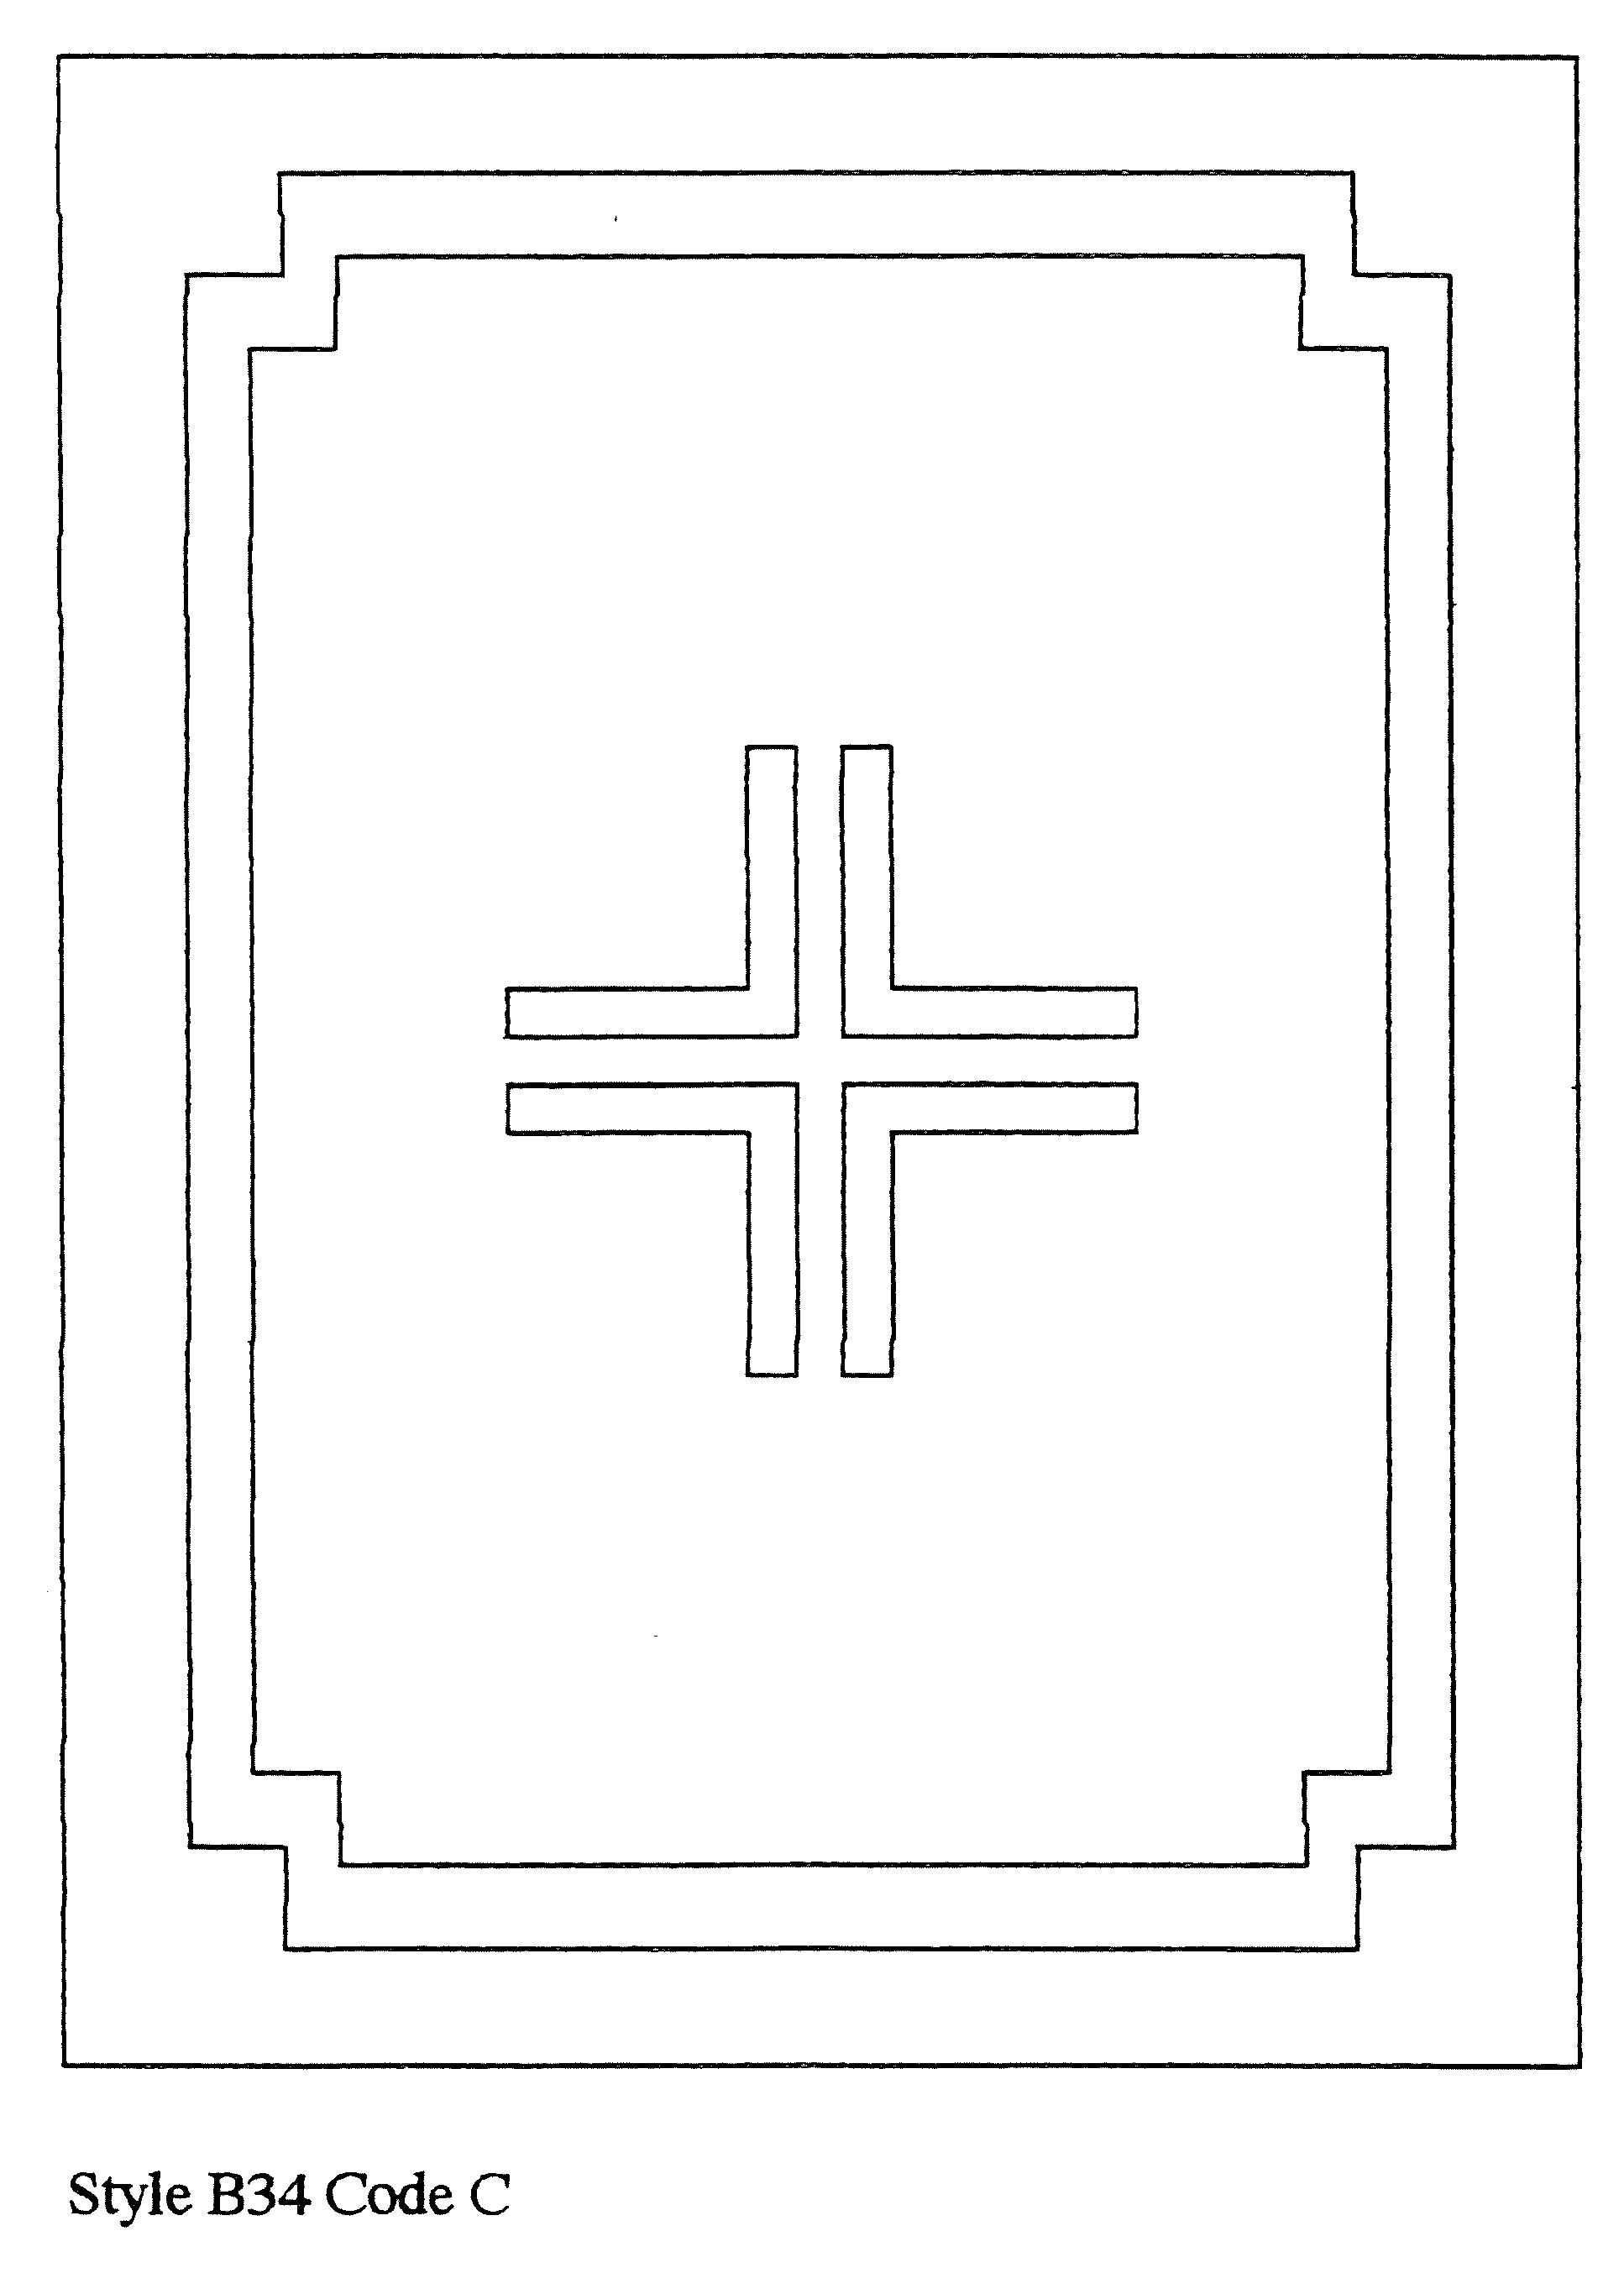 P1-B34.jpg